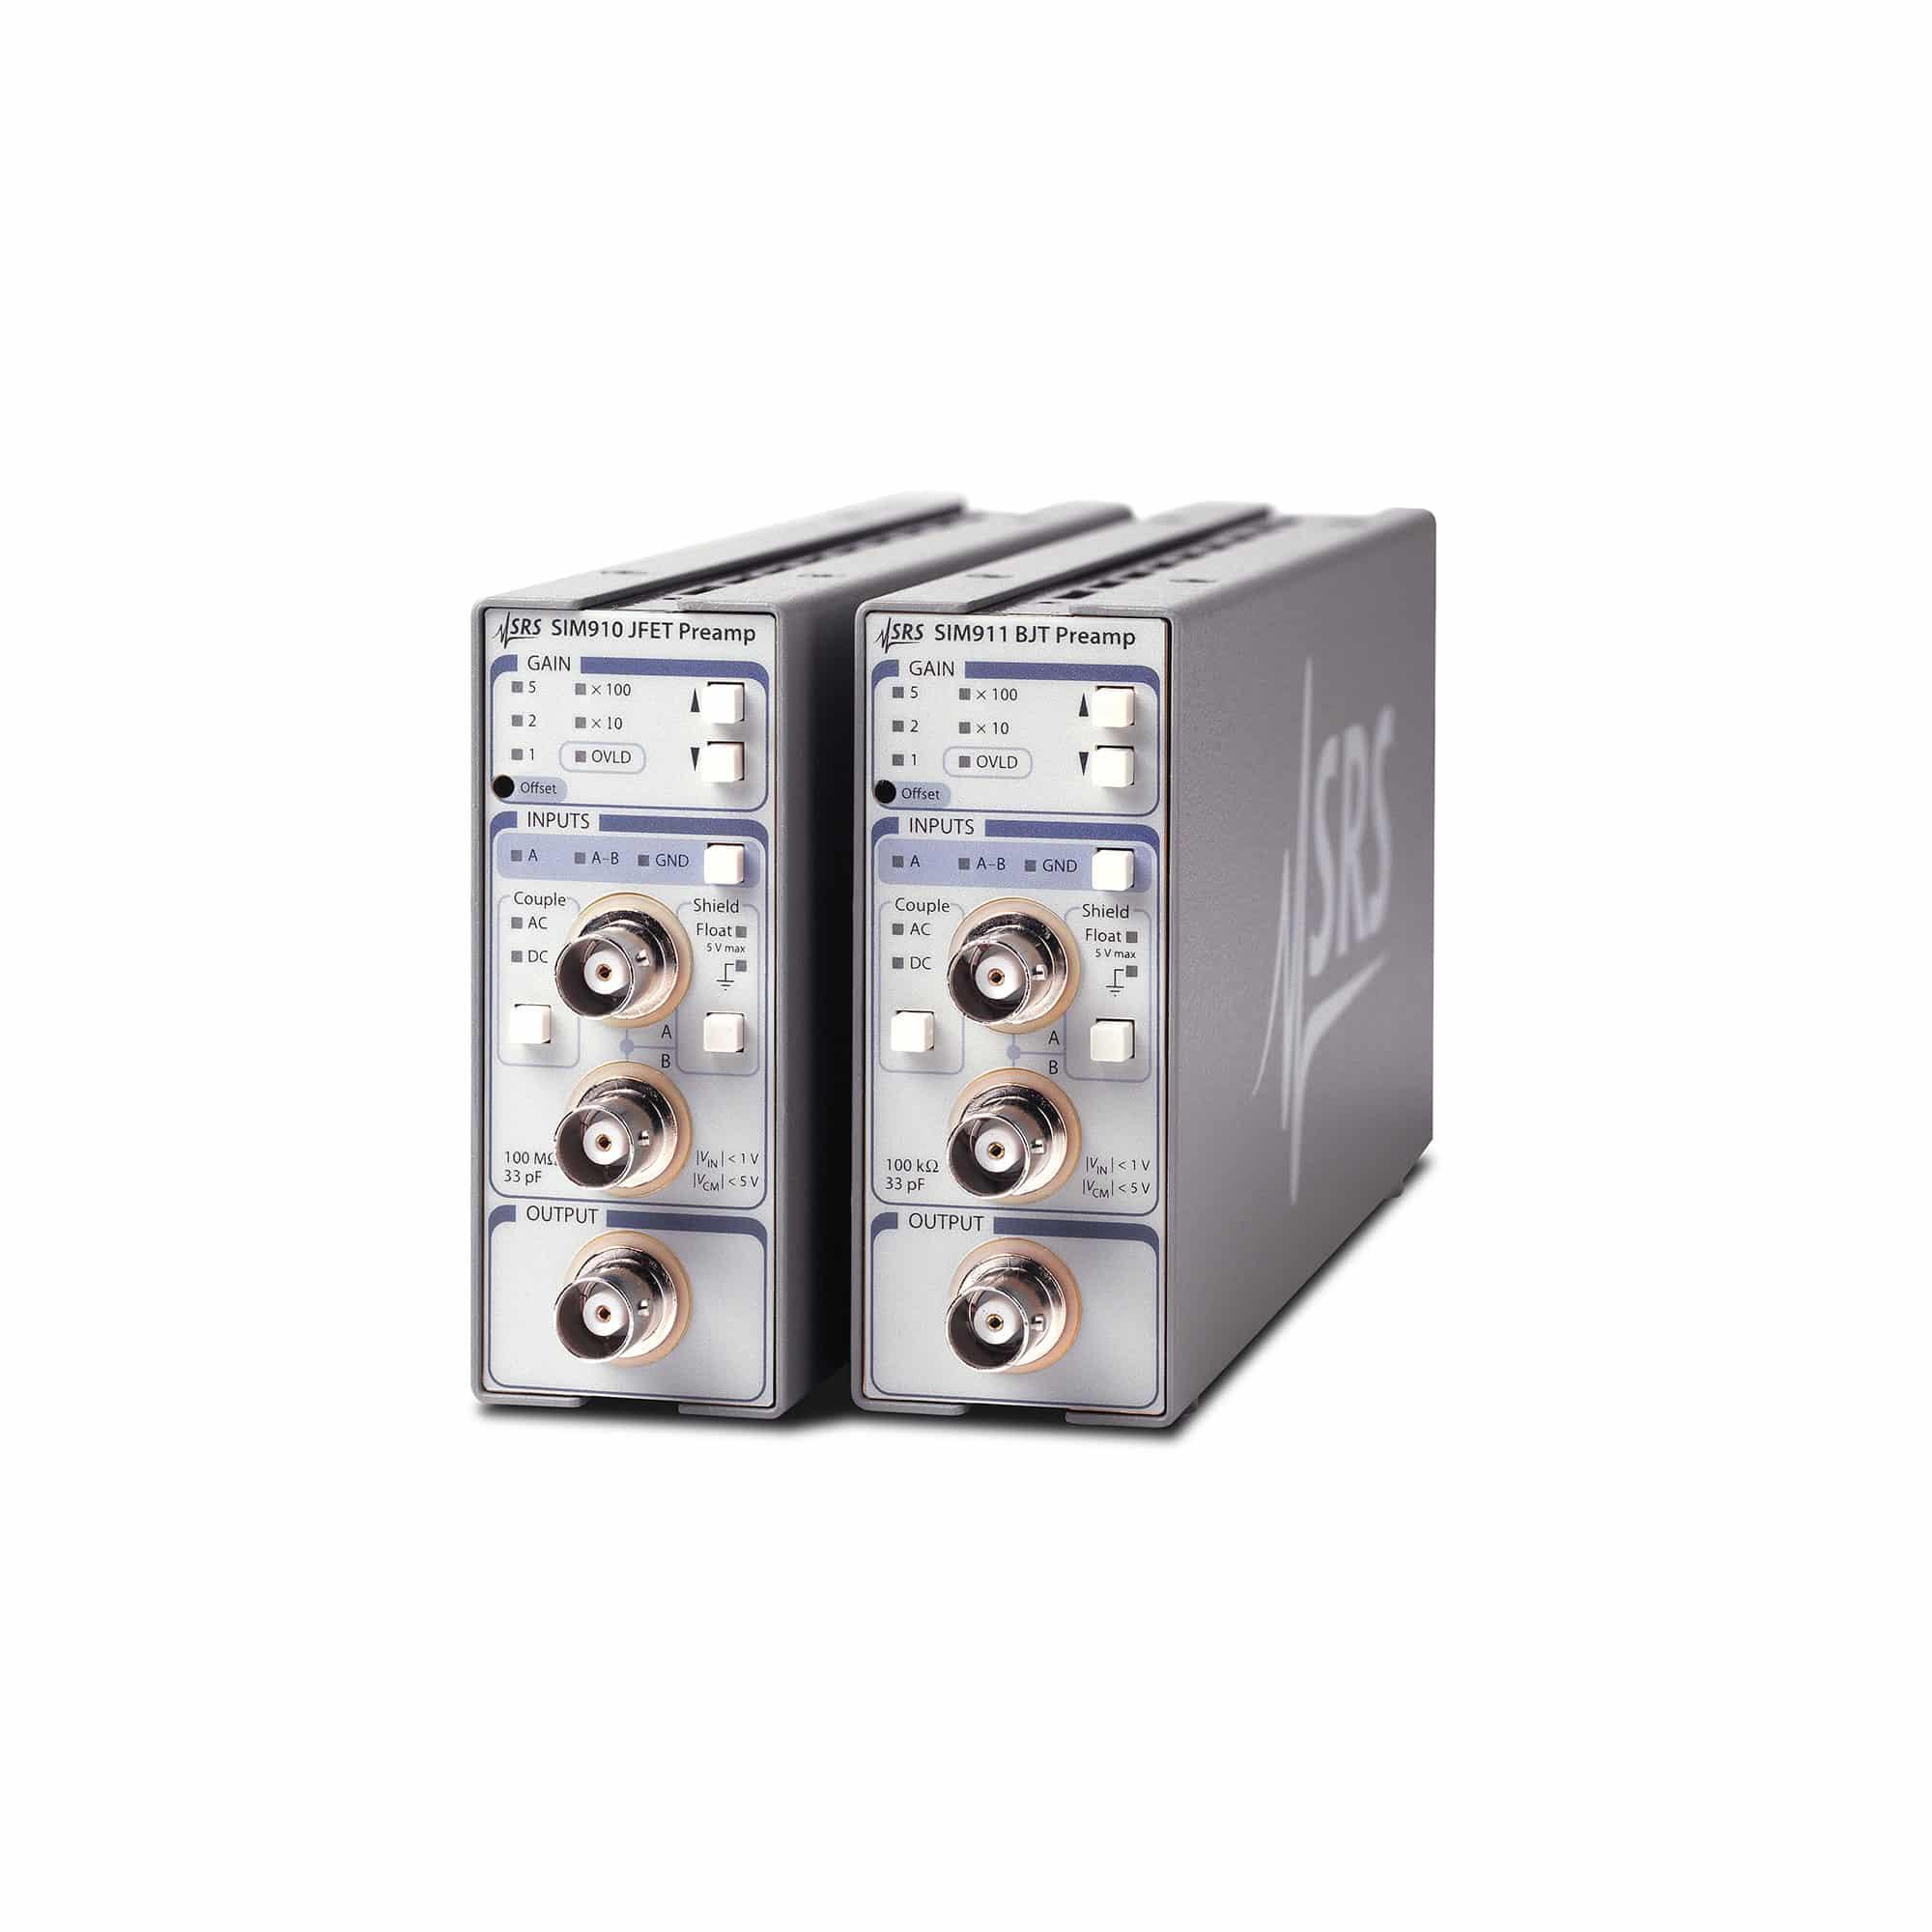 Produktfoto SIM910 & SIM911 JFET- & BJT-Spannungsvorverstärkermodule